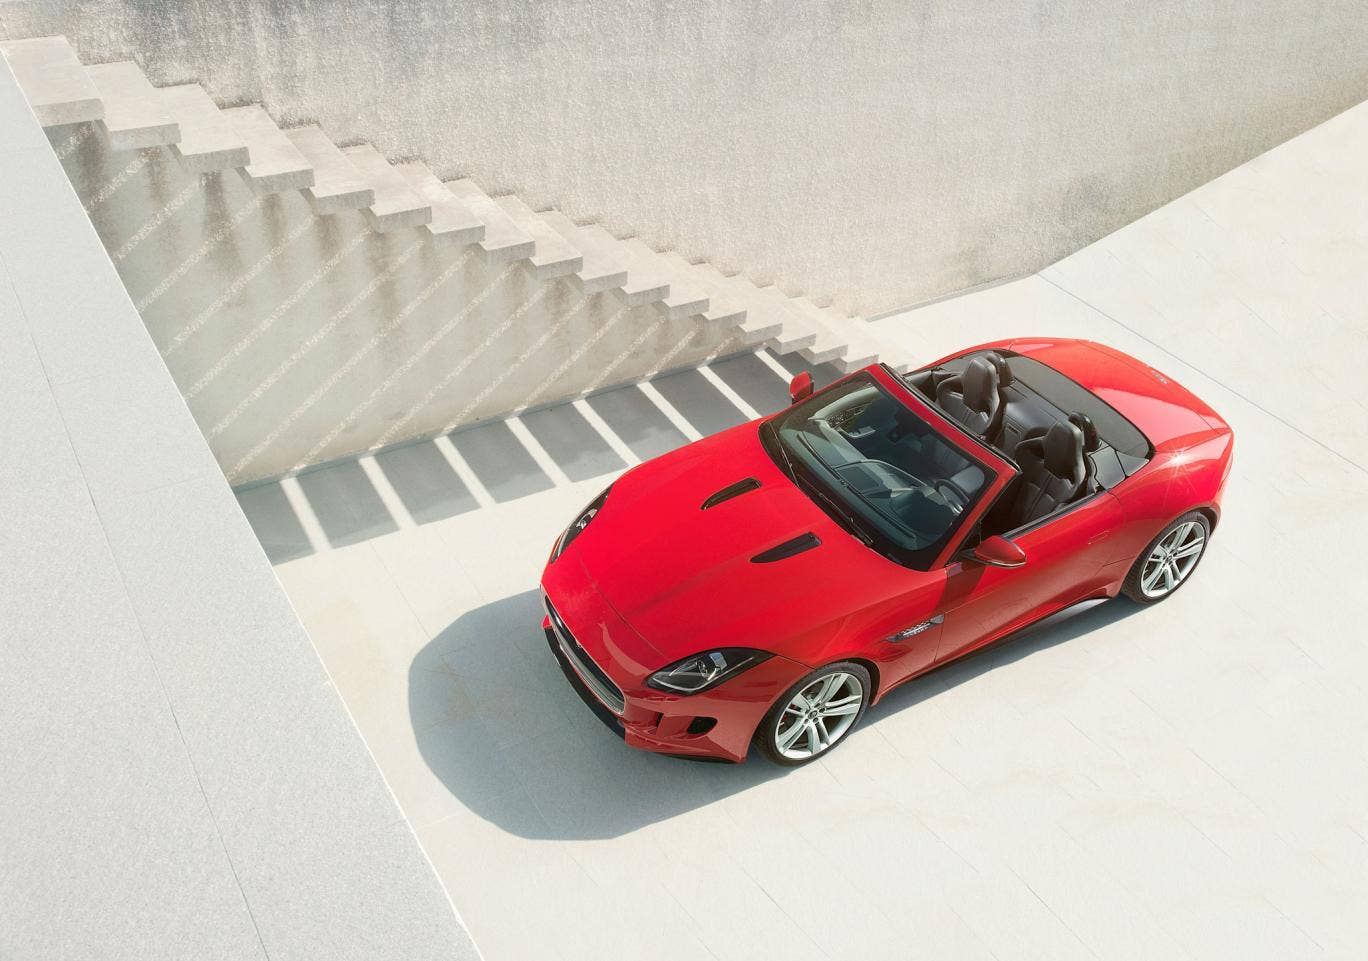 Worth the wait: The Jaguar F-Type V6 S